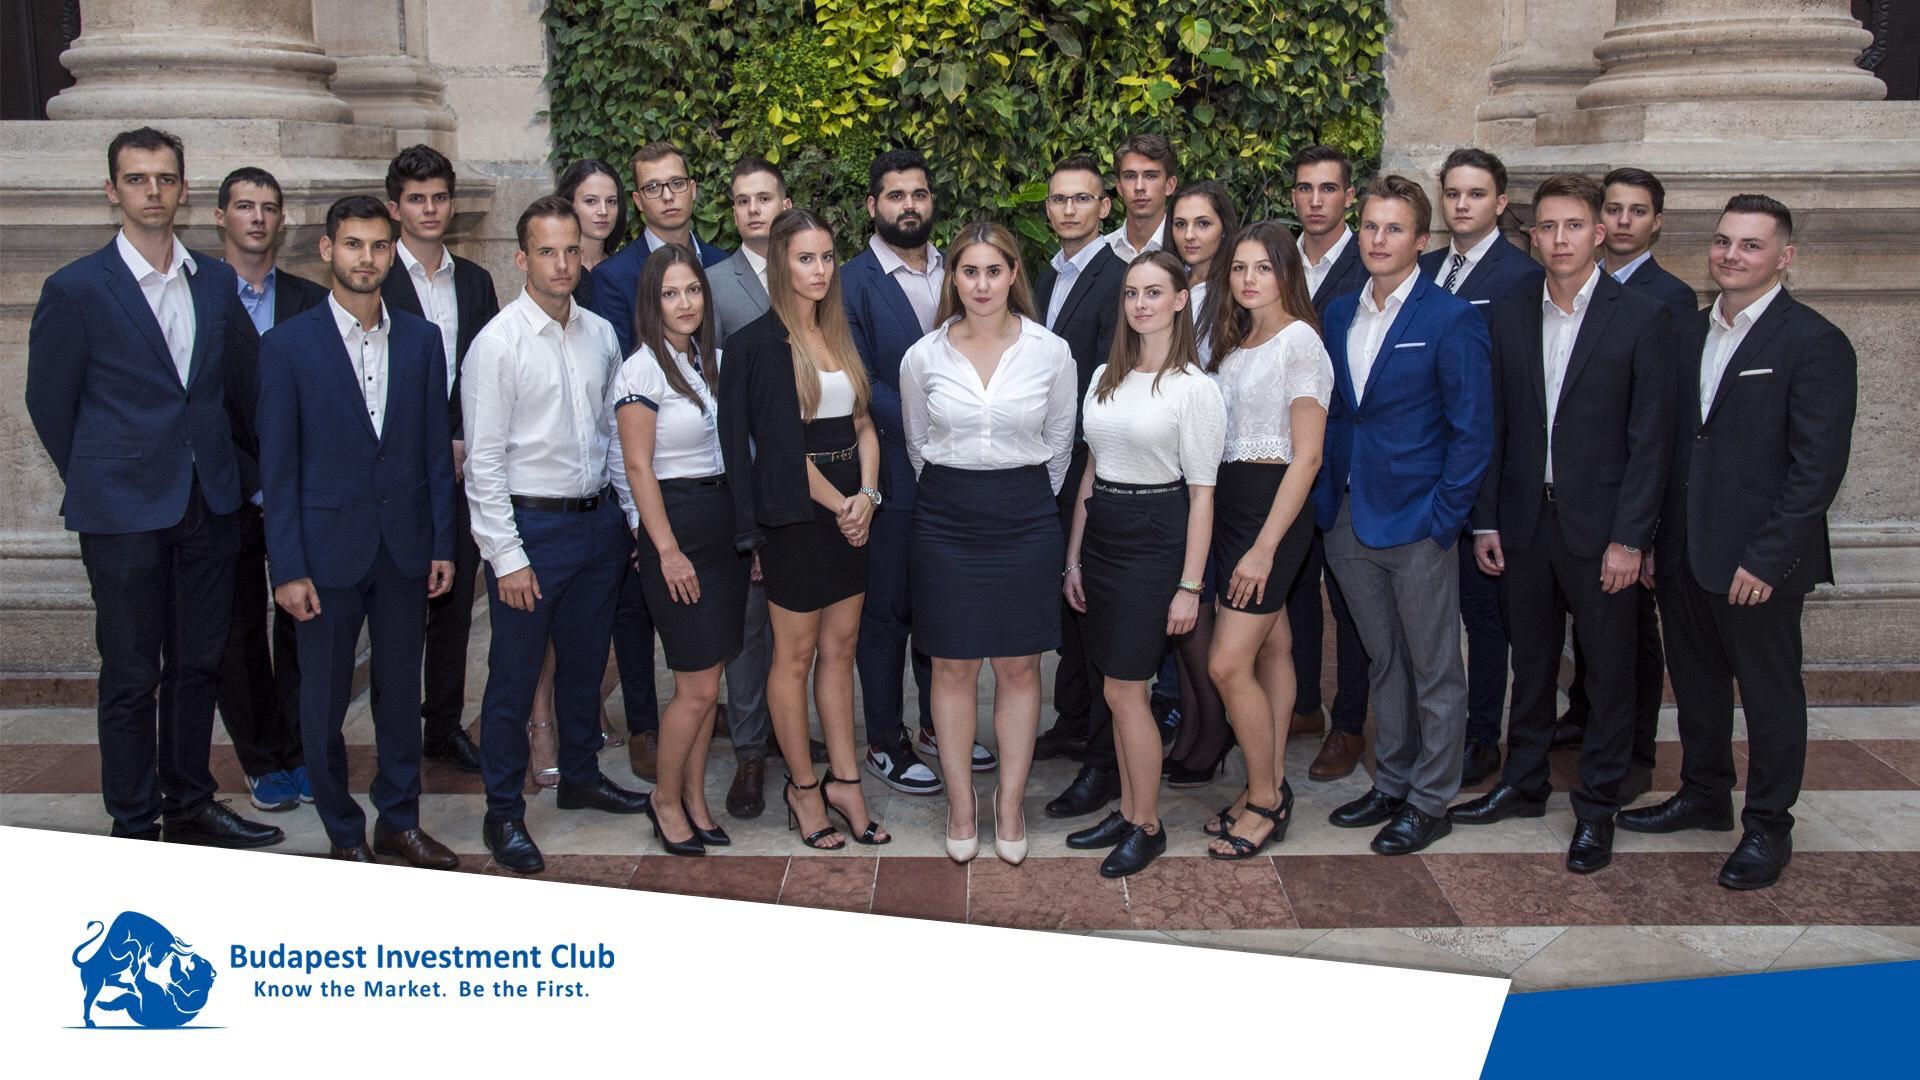 Budapest Investment Club